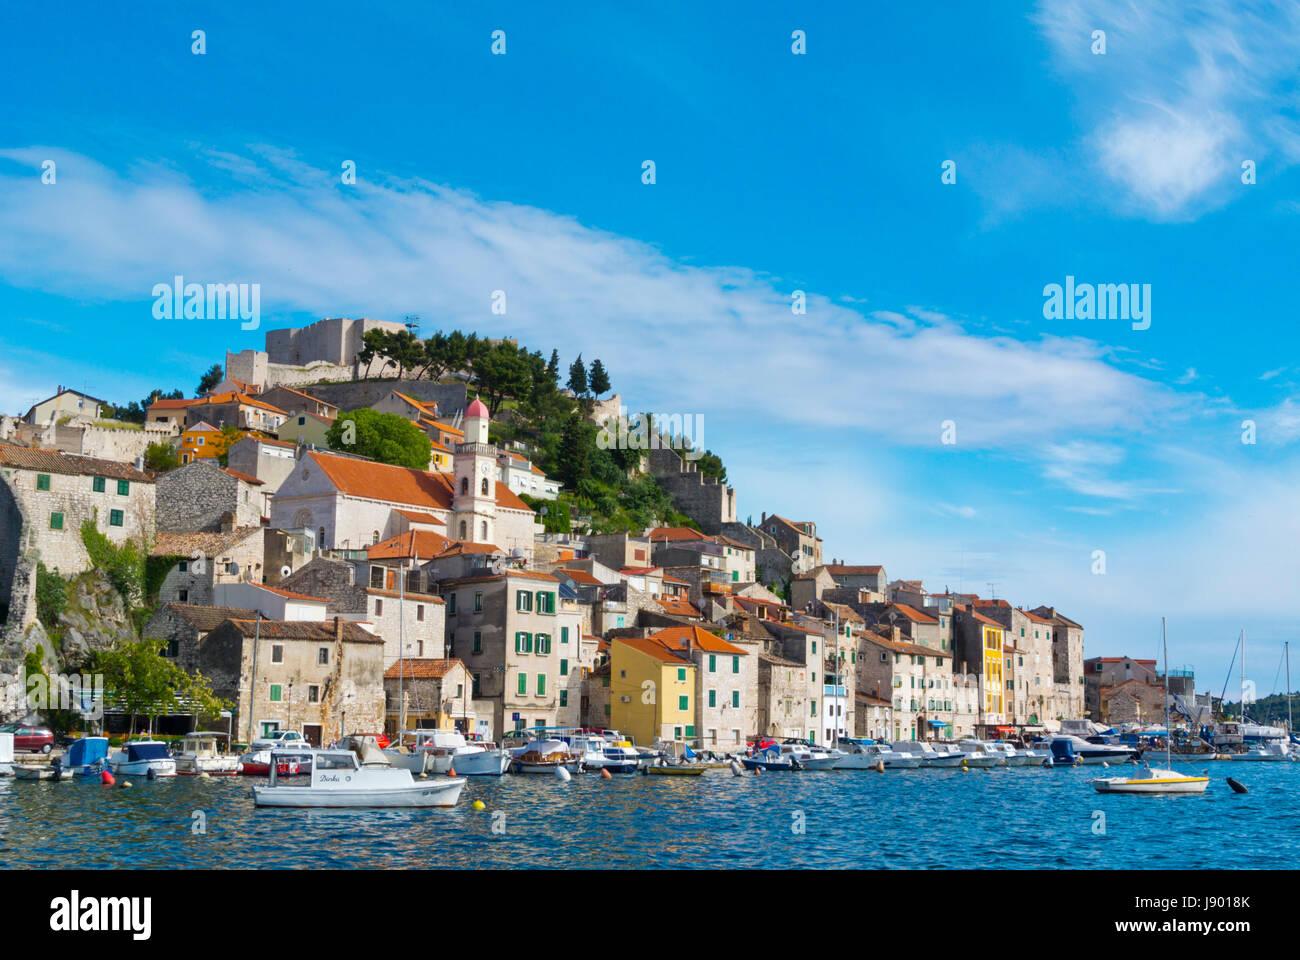 St Michaels Festung auf Hügel, Dolac Nachbarschaft, Sibenik, Dalmatien, Kroatien Stockfoto